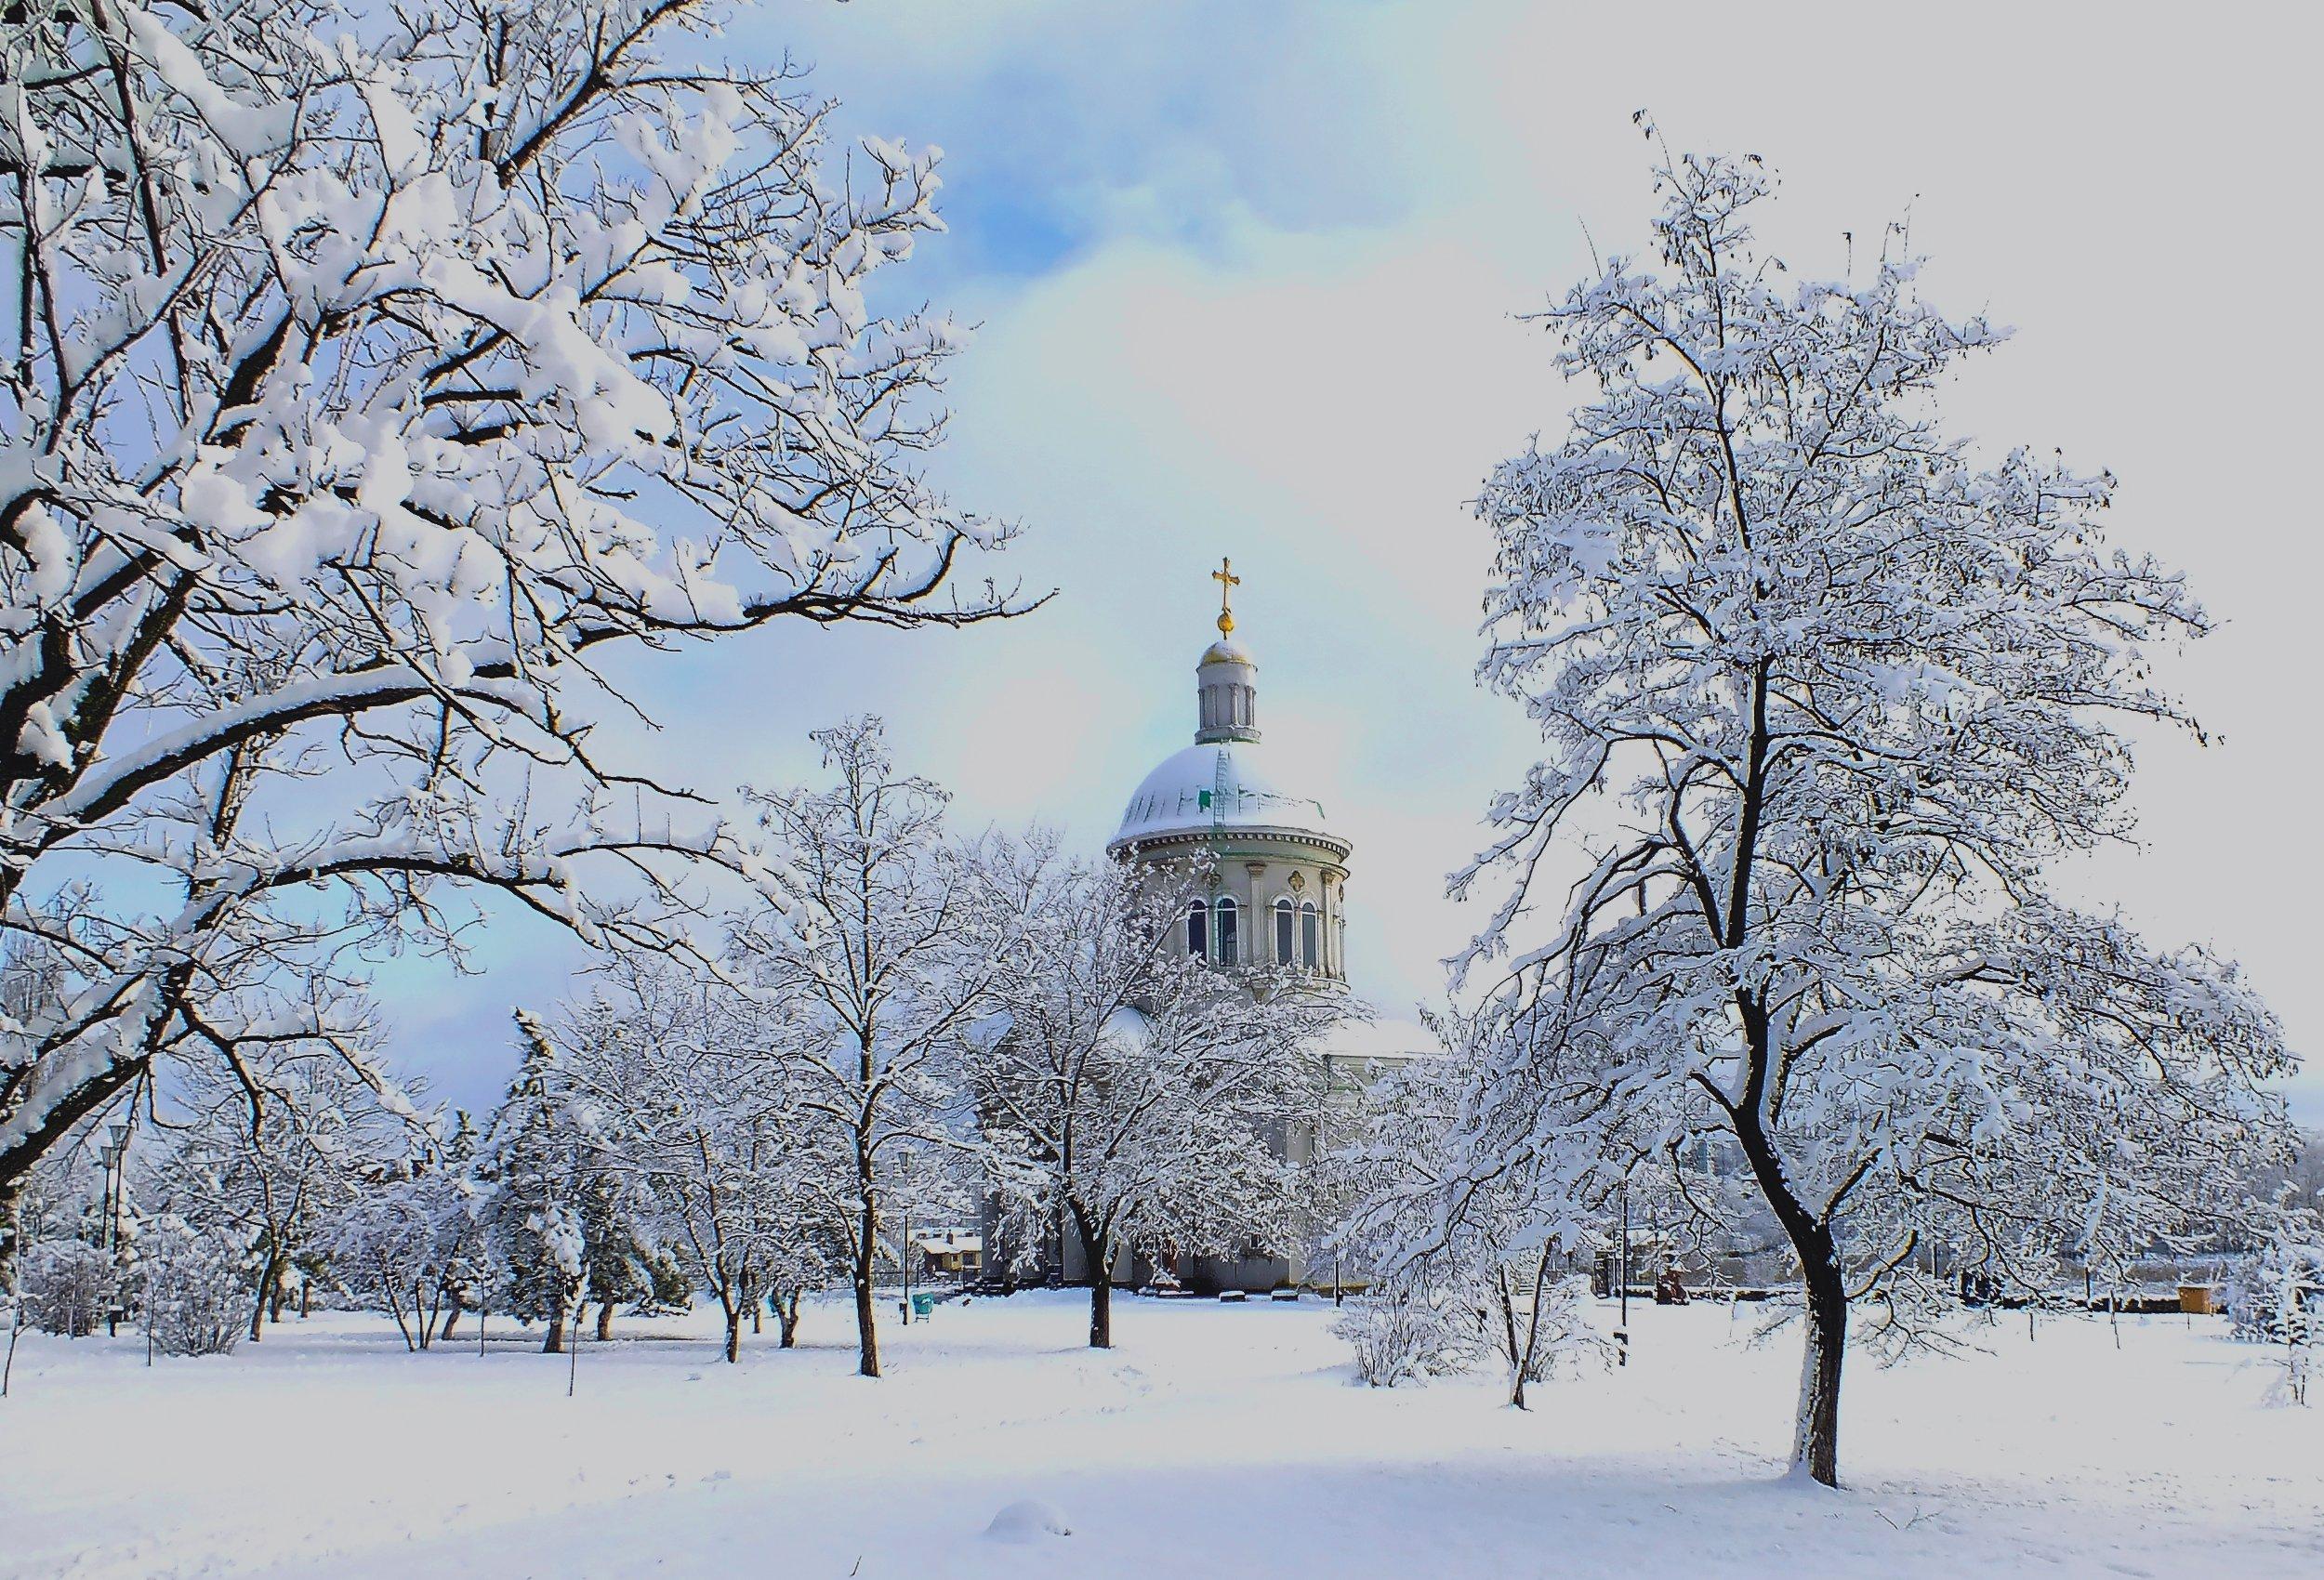 #город, #зима, #природа, #Ростов-на-Дону, #храм, #церковь, Константин Слободчук